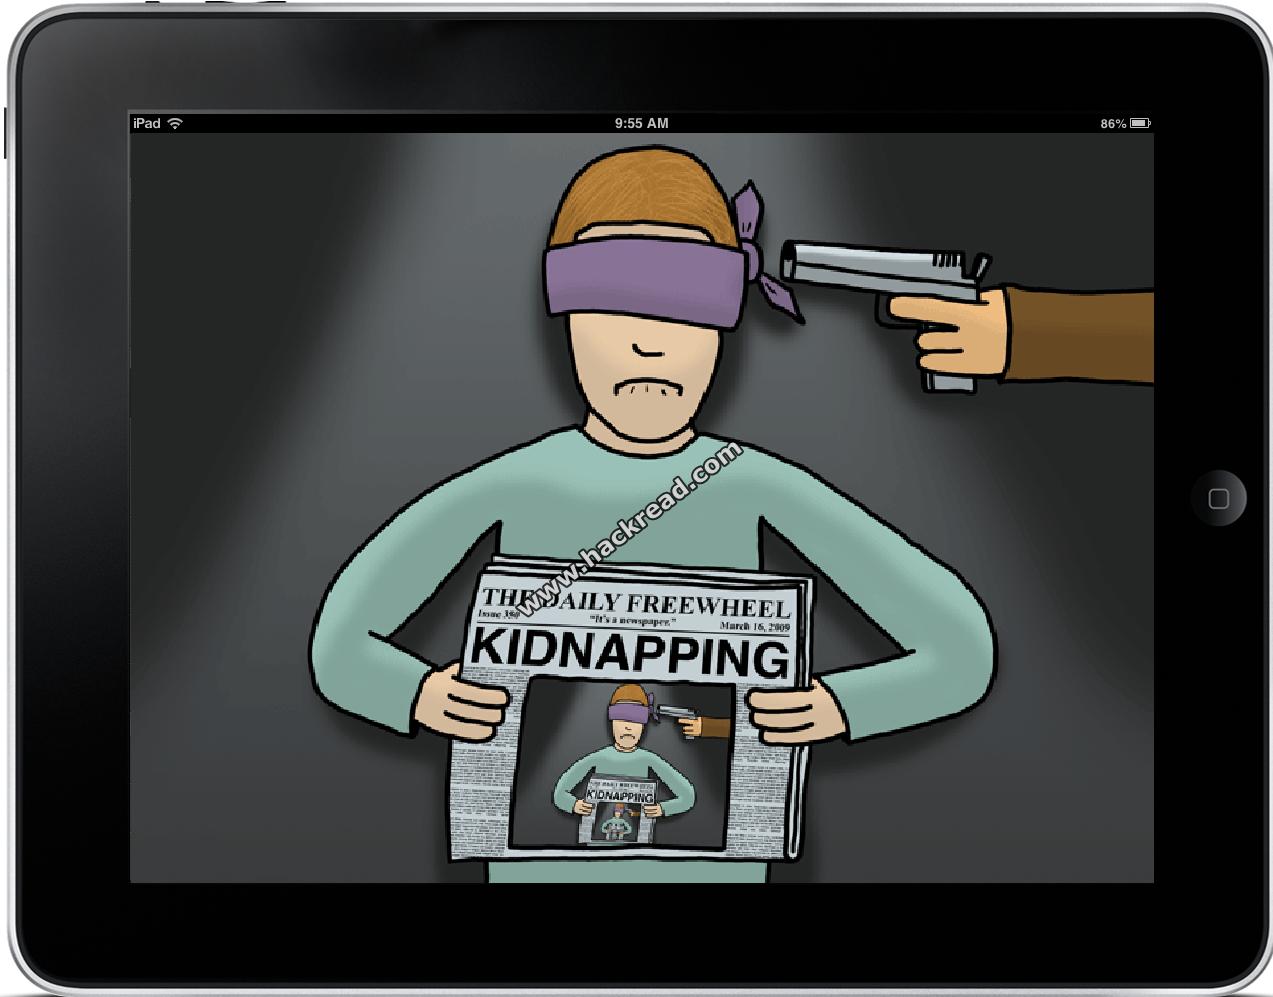 Girl fakes kidnapping for iPad